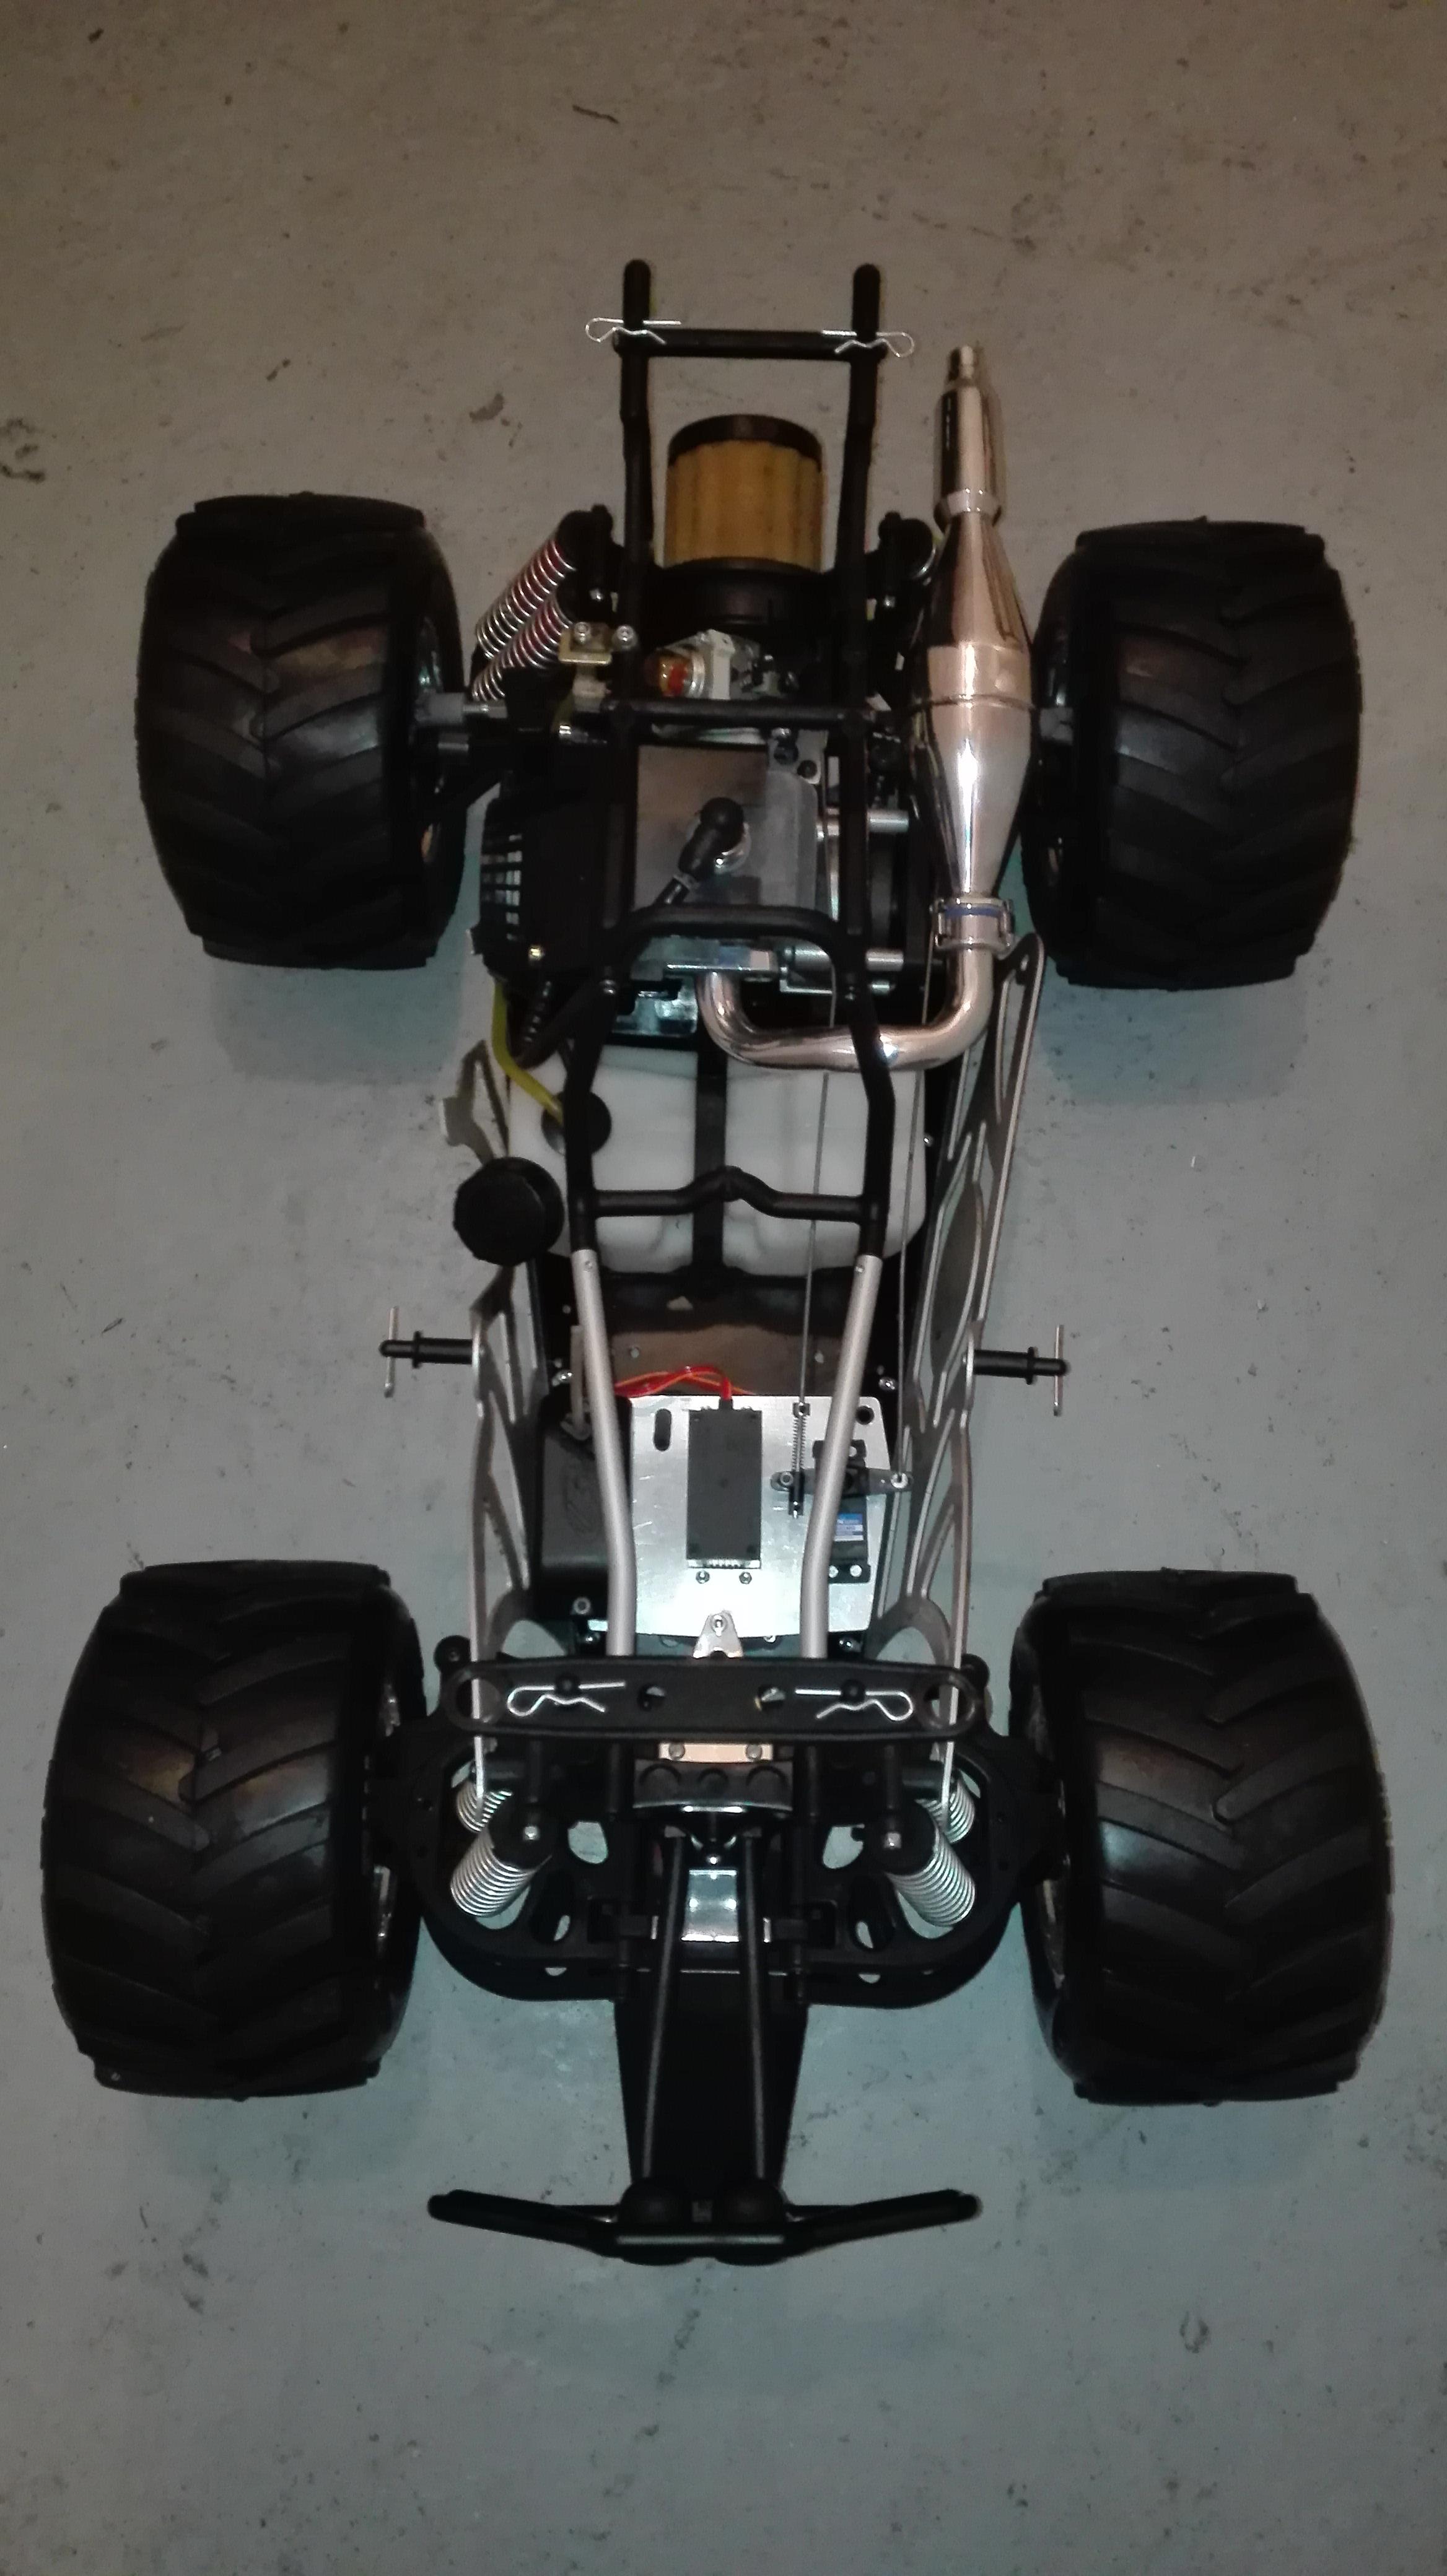 re-montage complet monster truck FG depuis un chassis nu - Page 2 180410111811201292